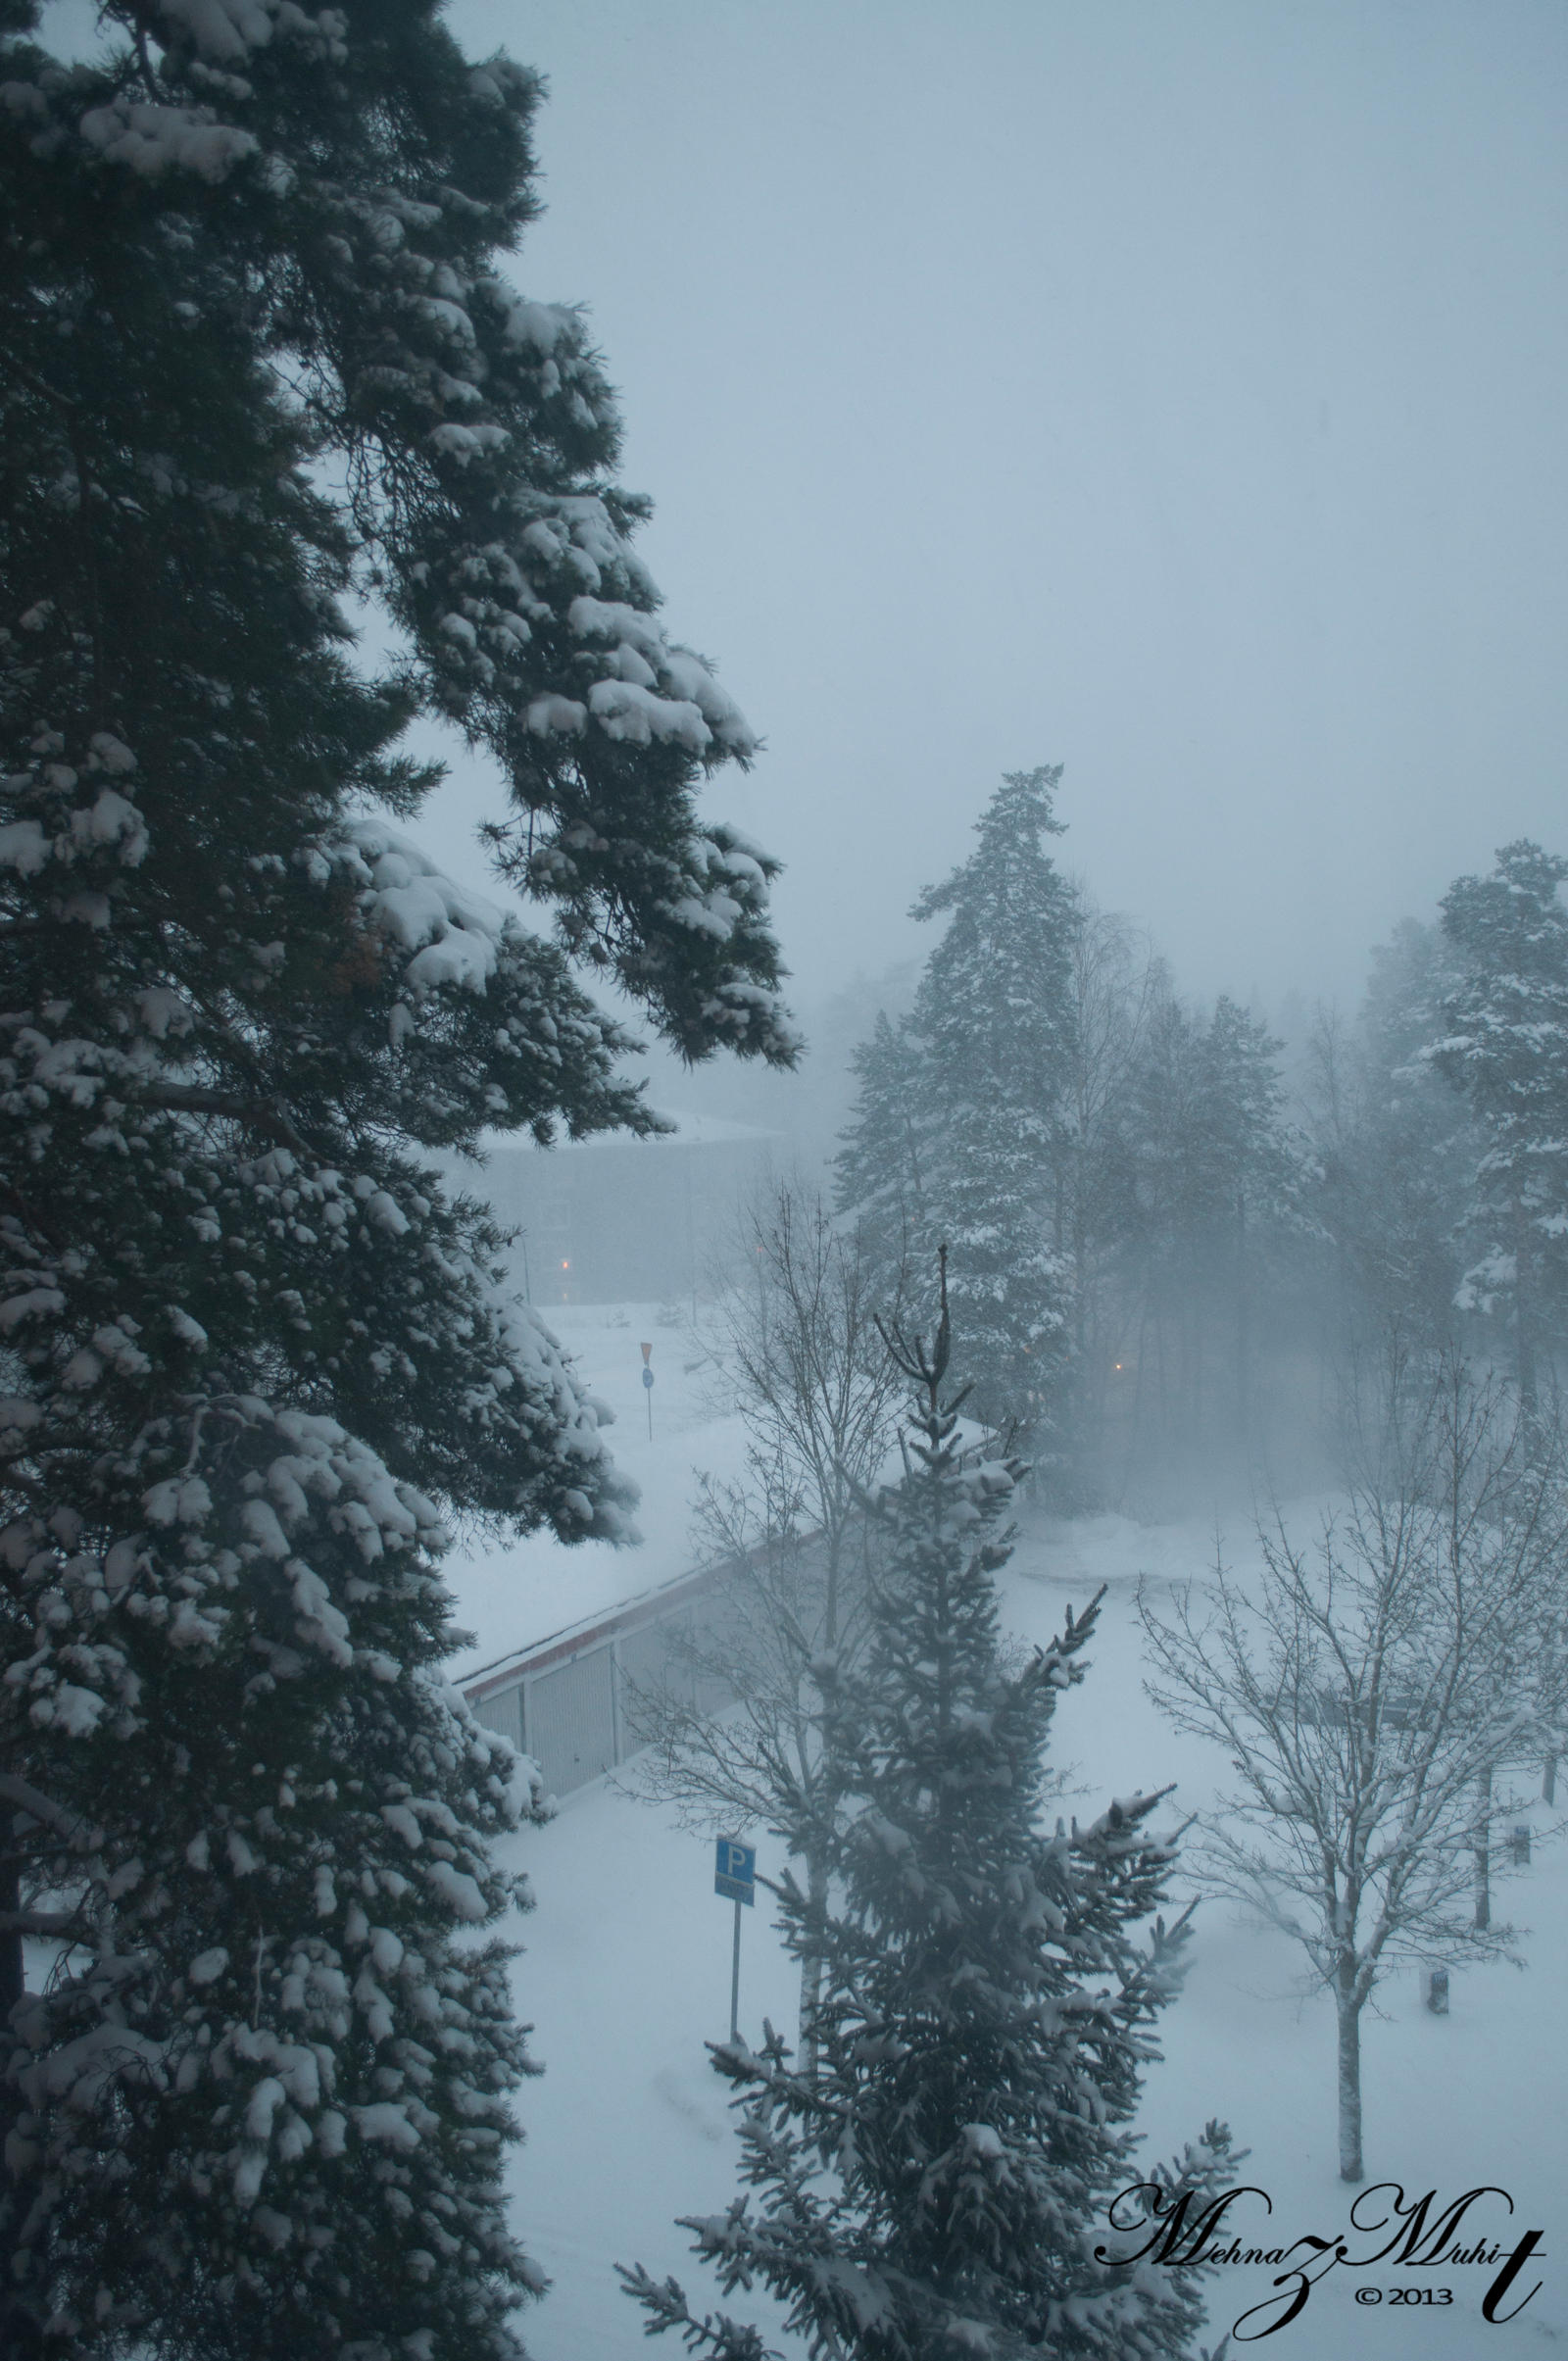 Snowstorm by iMehnaz